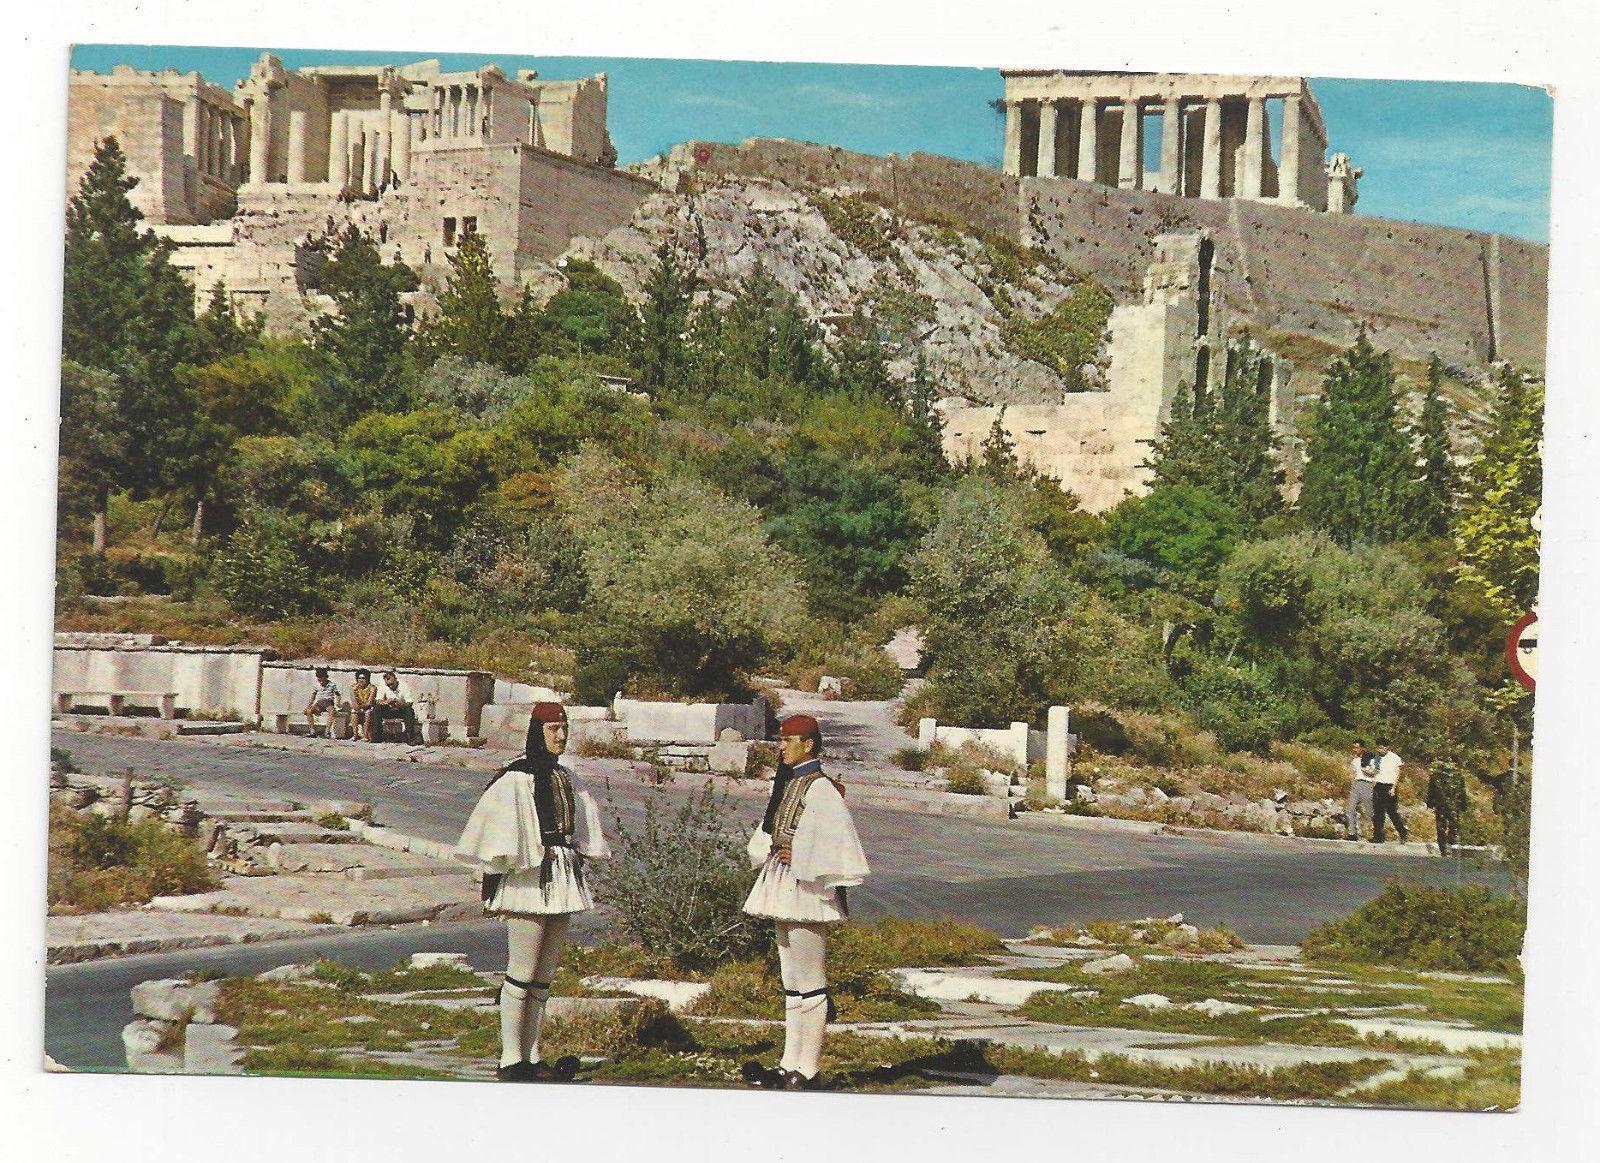 Greece Athens Royal Guards Evzone Acropolis Uniform Vintage Postcard 4X6